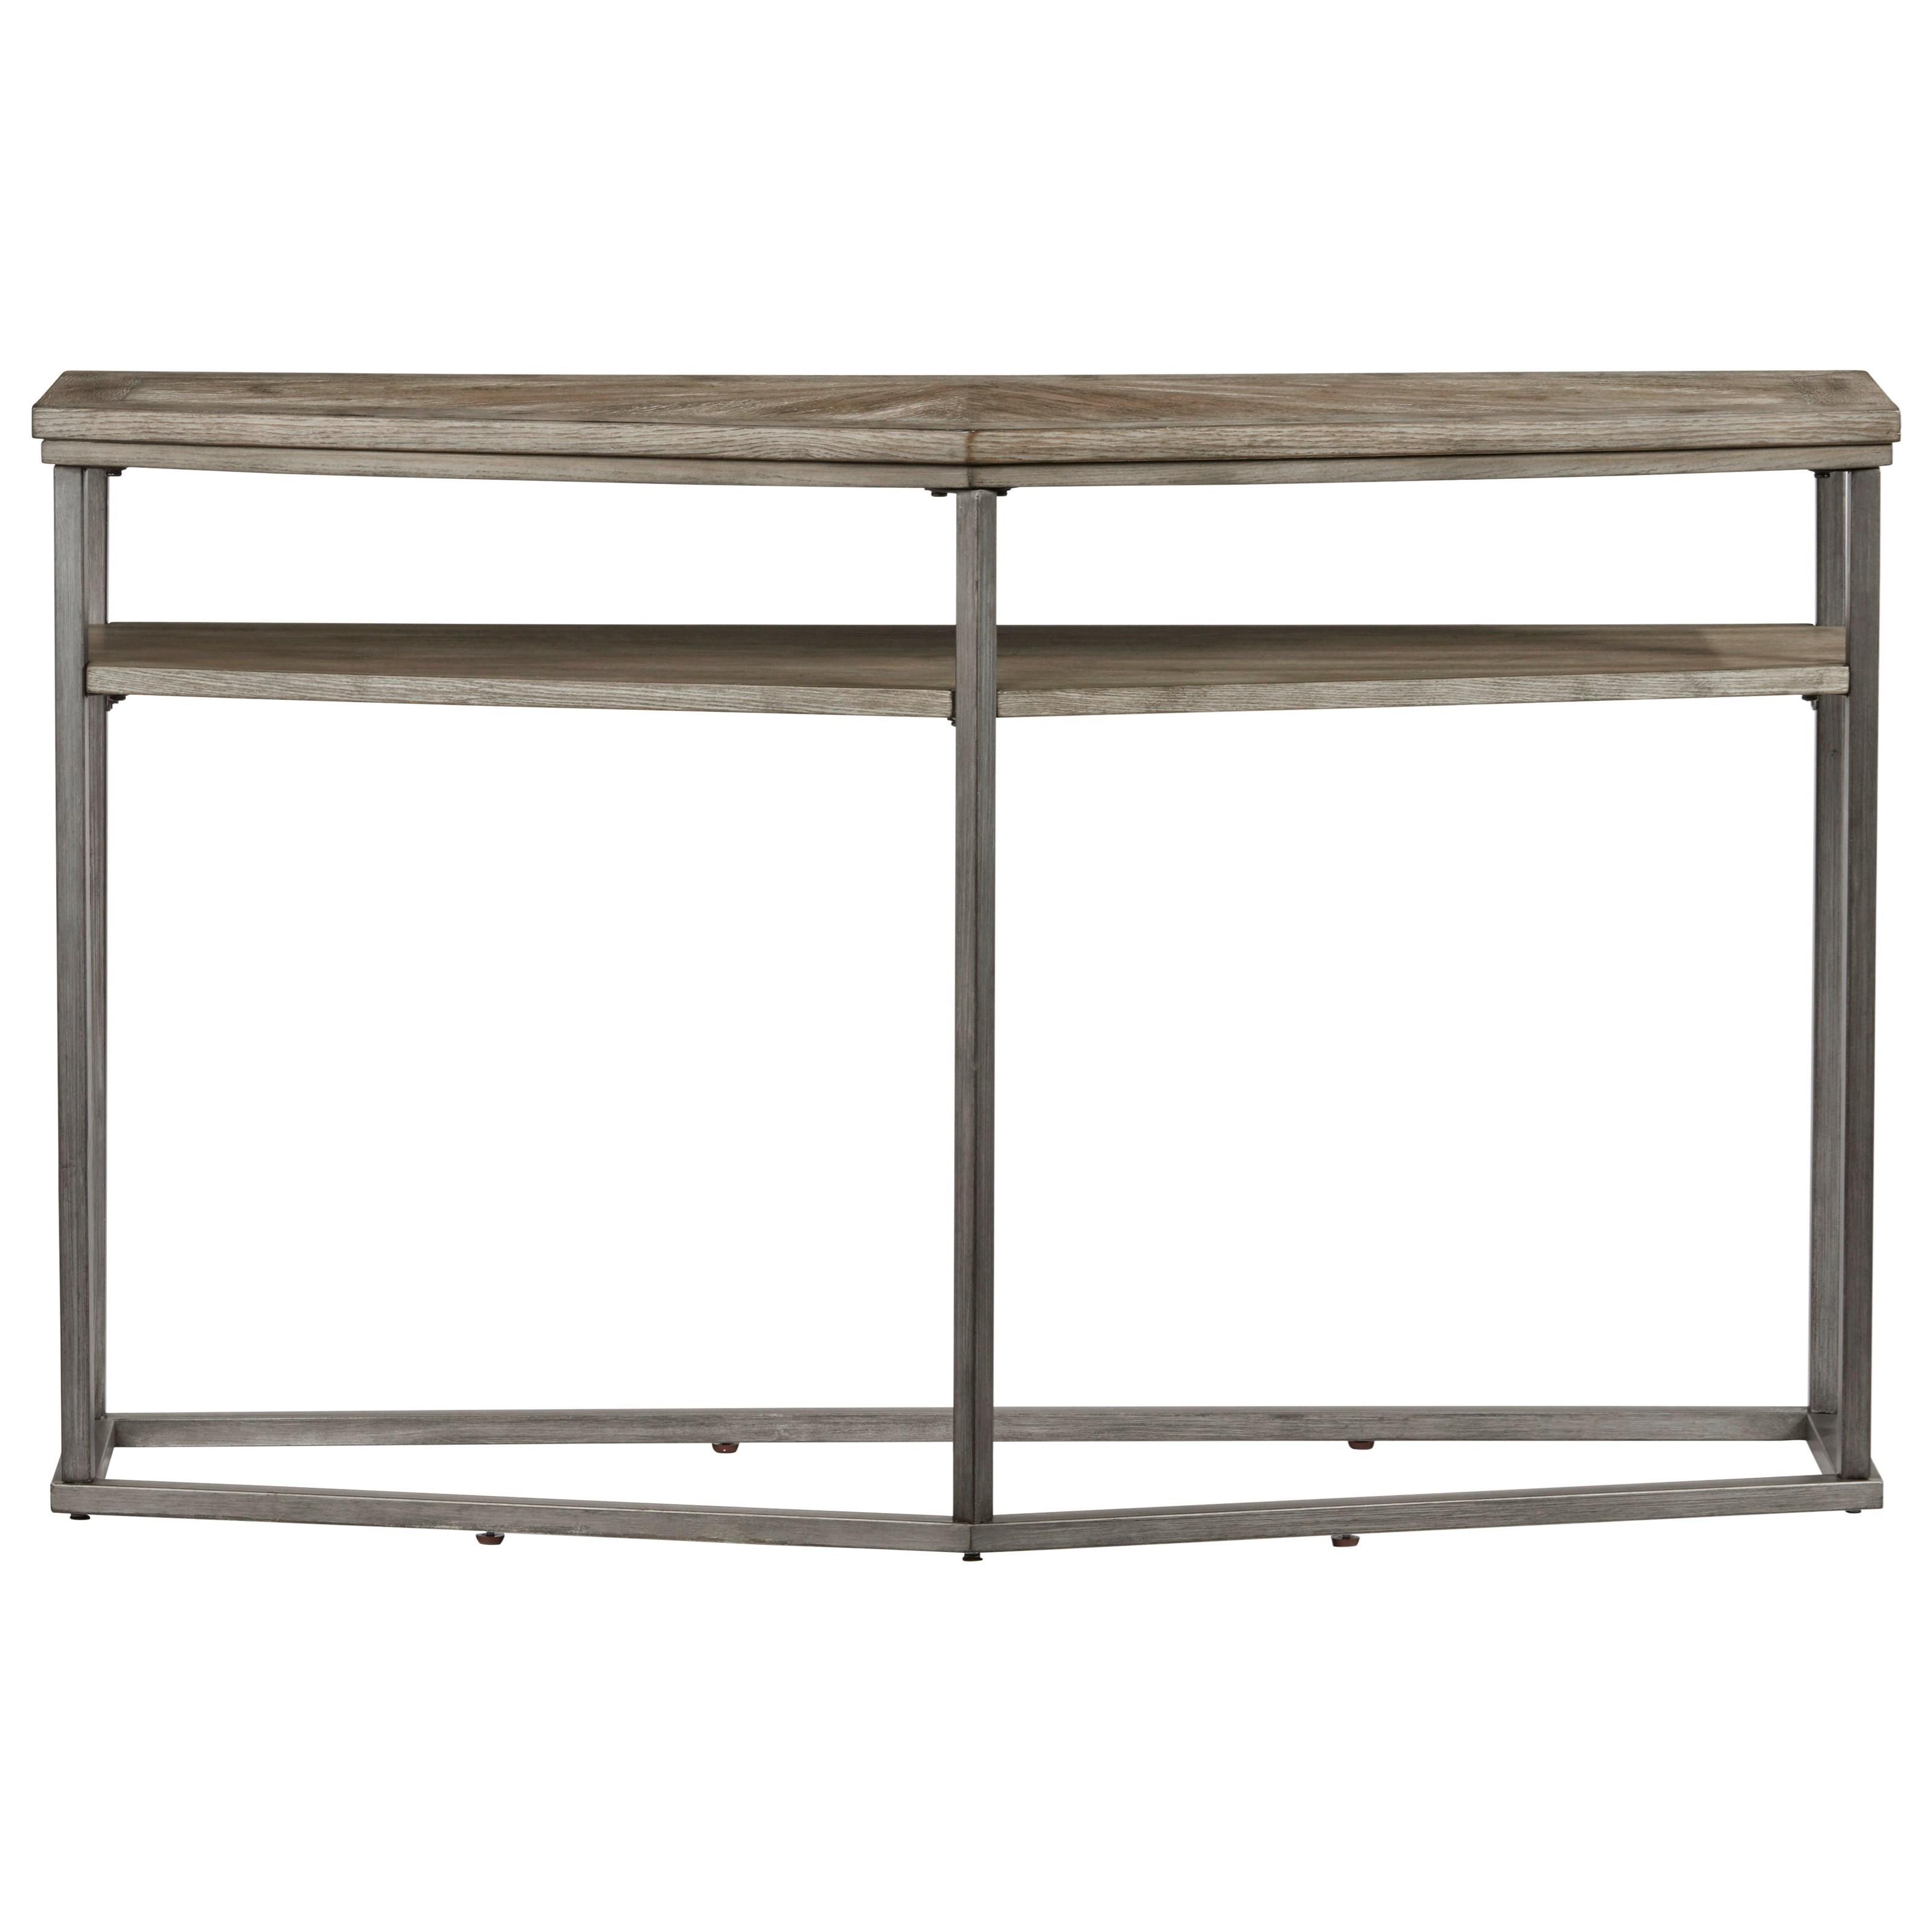 Progressive Furniture Adison Cove Ash Veneer Sofa/Console Table With Metal  Frame | VanDrie Home Furnishings | Sofa Tables/Consoles